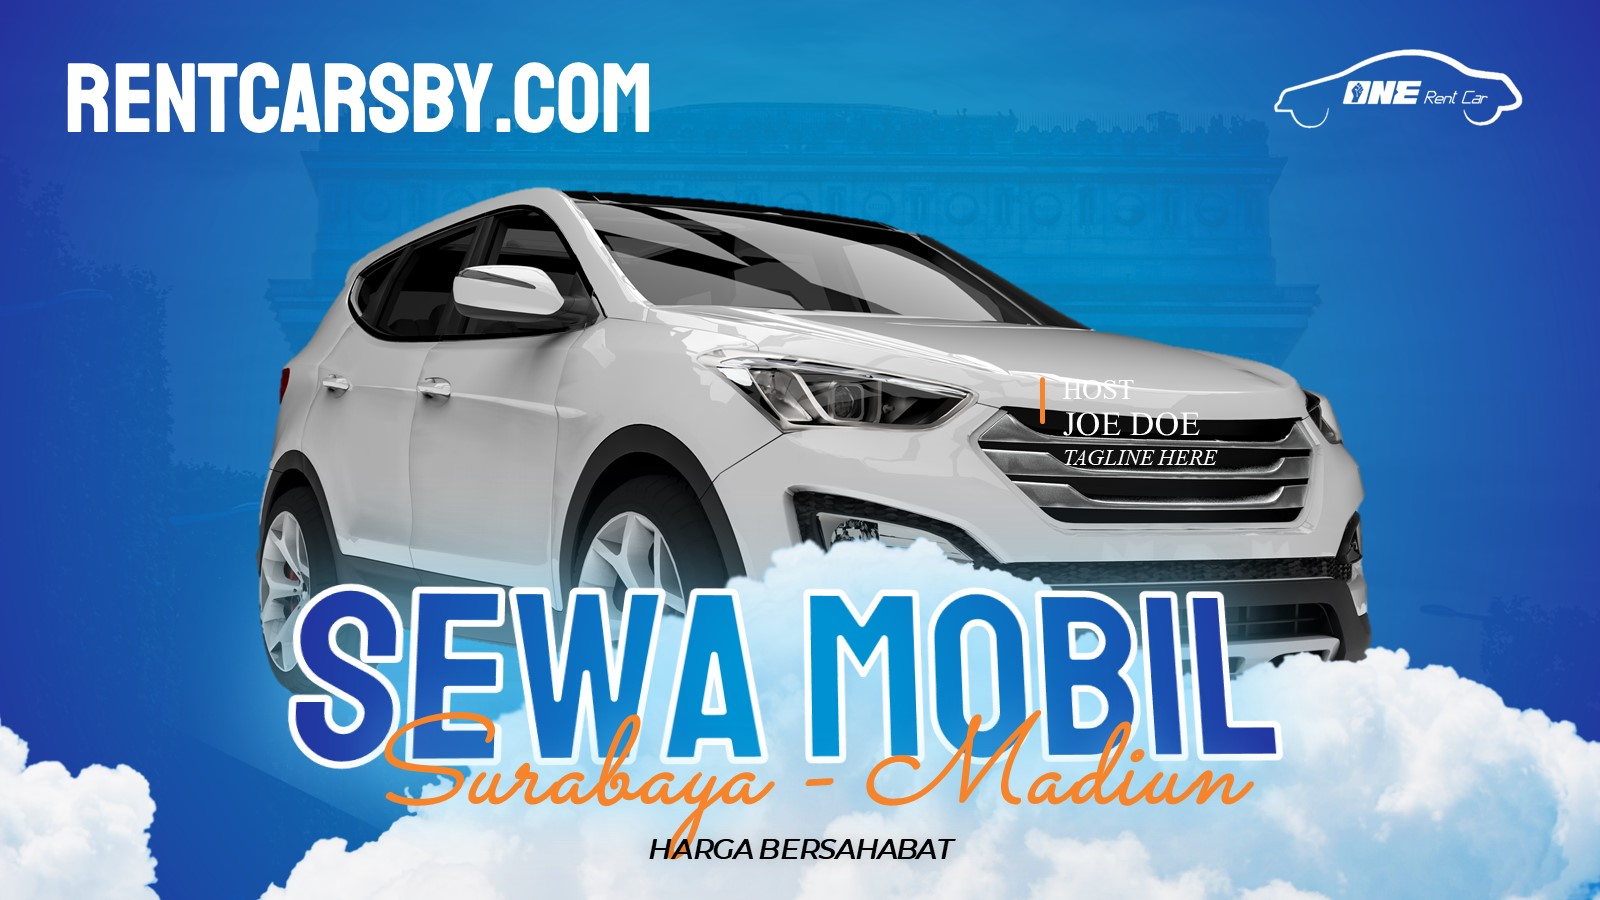 Sewa Mobil Surabaya Murah Lepas Kunci (Mulai 150/day) 1